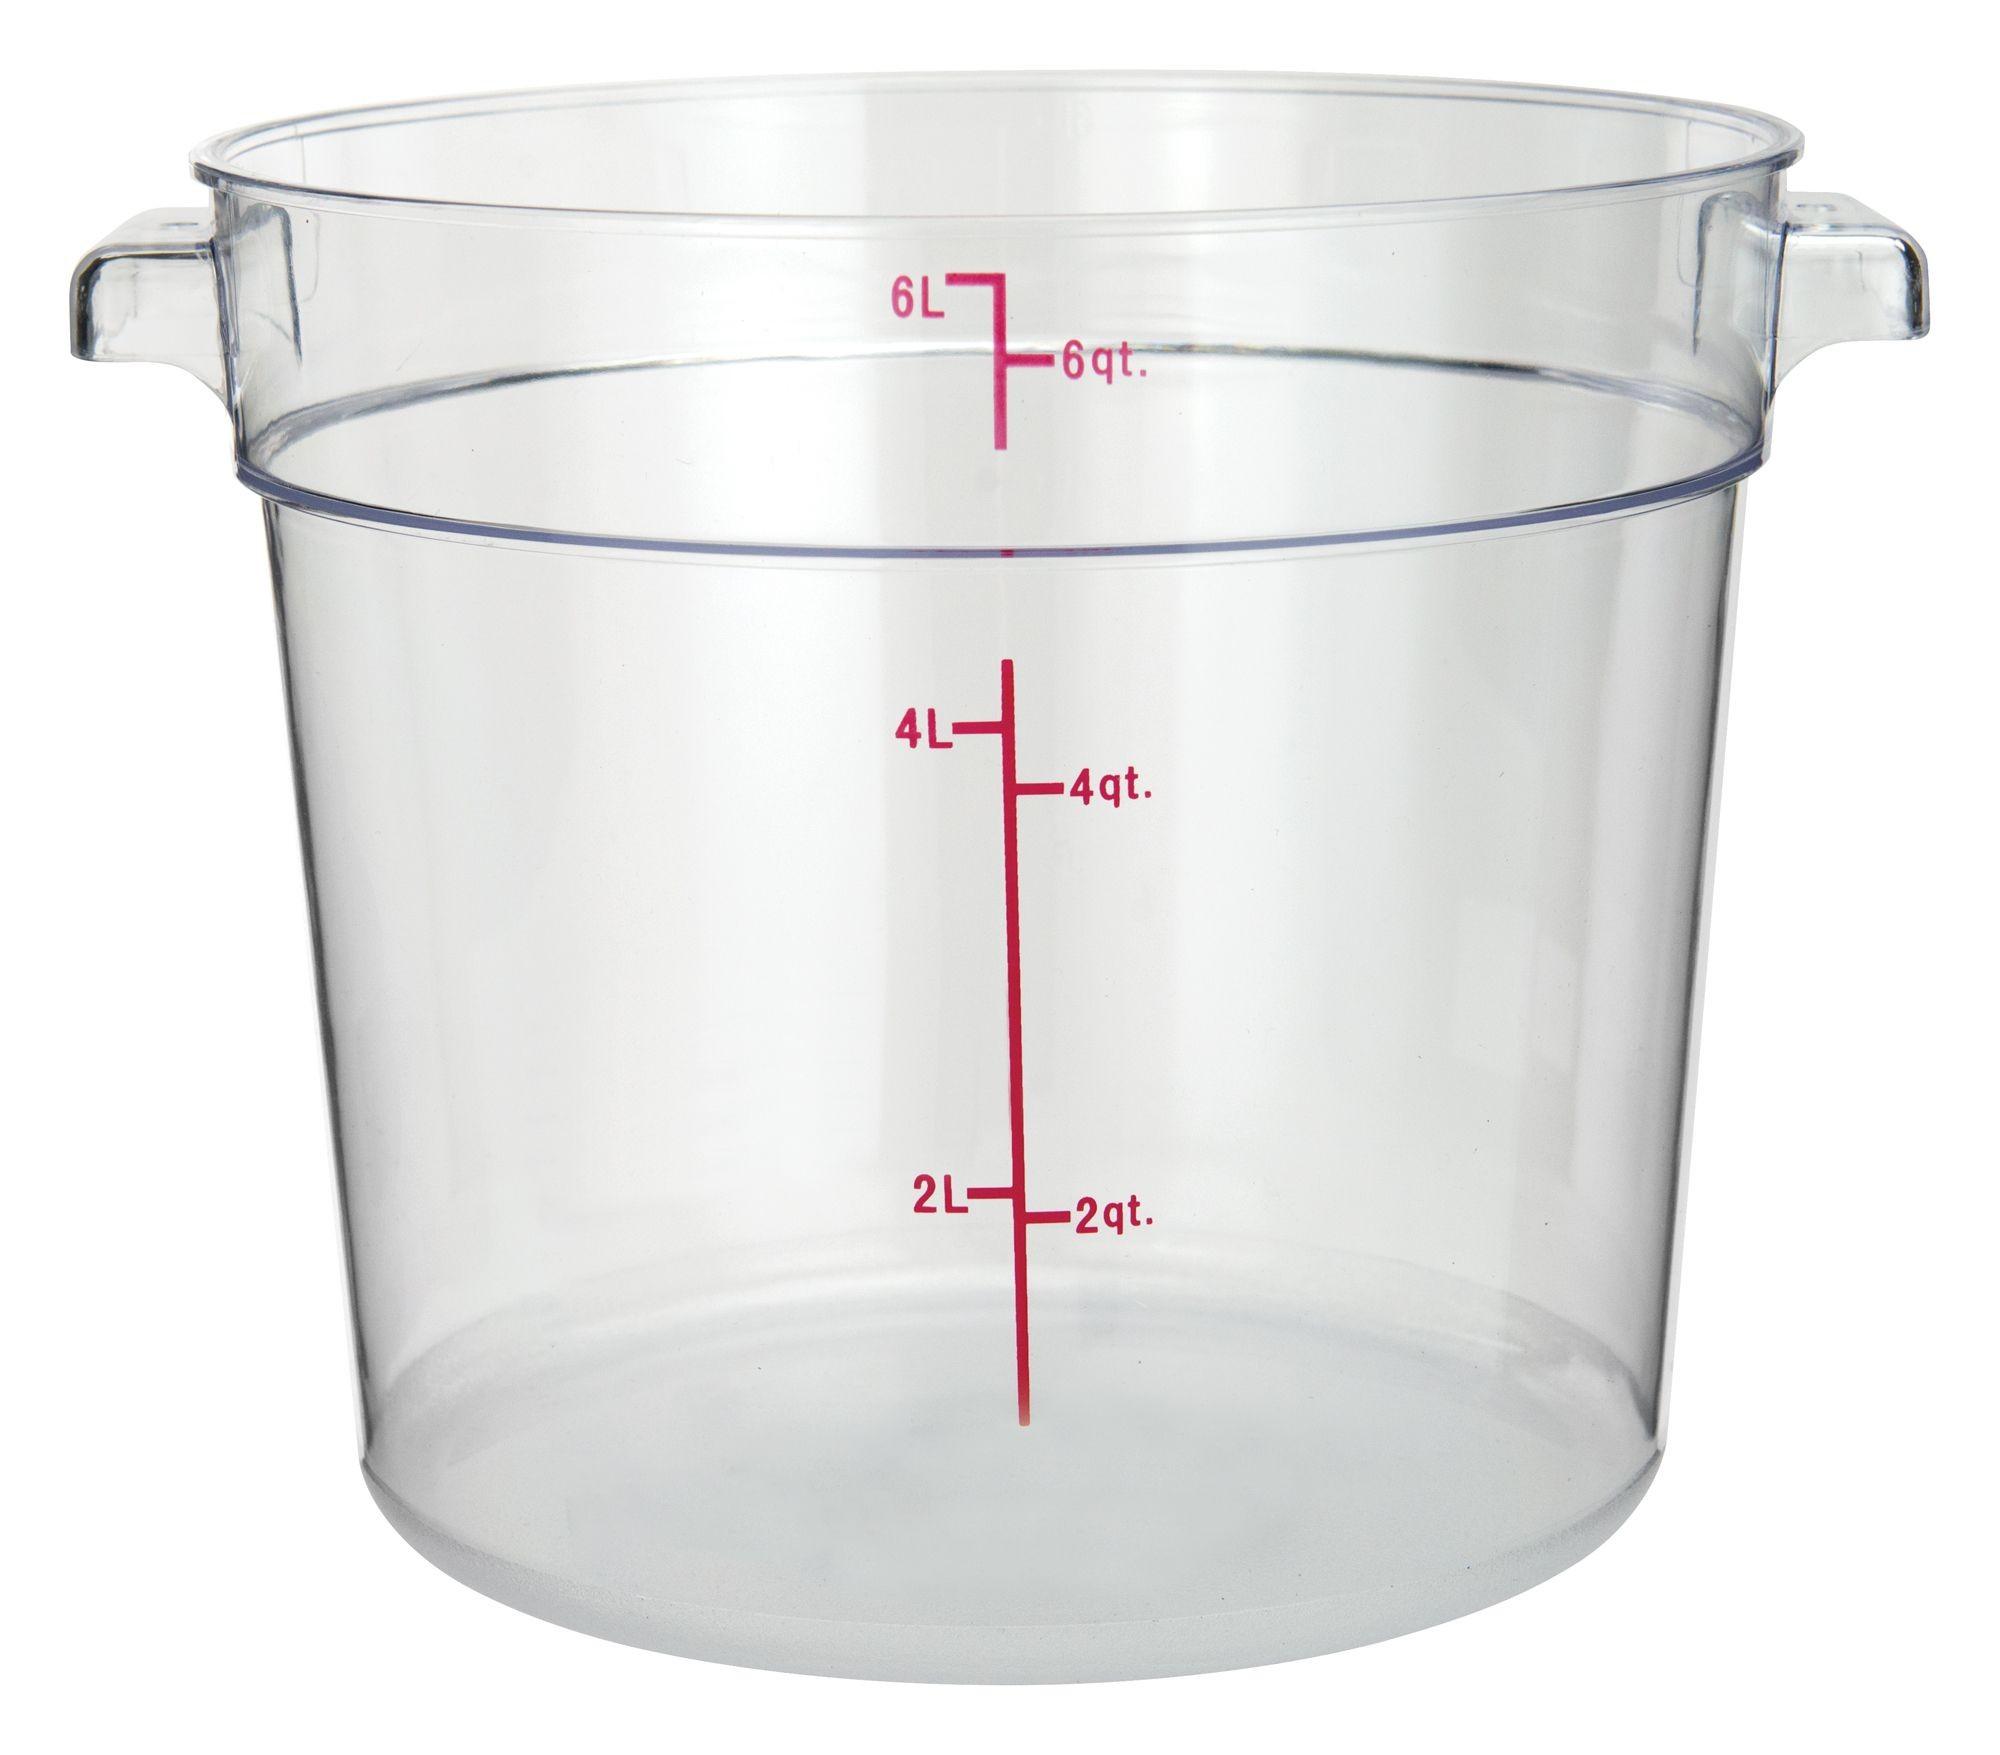 Winco PCRC-6 Round Polycarbonate Storage Container, 6 Qt.